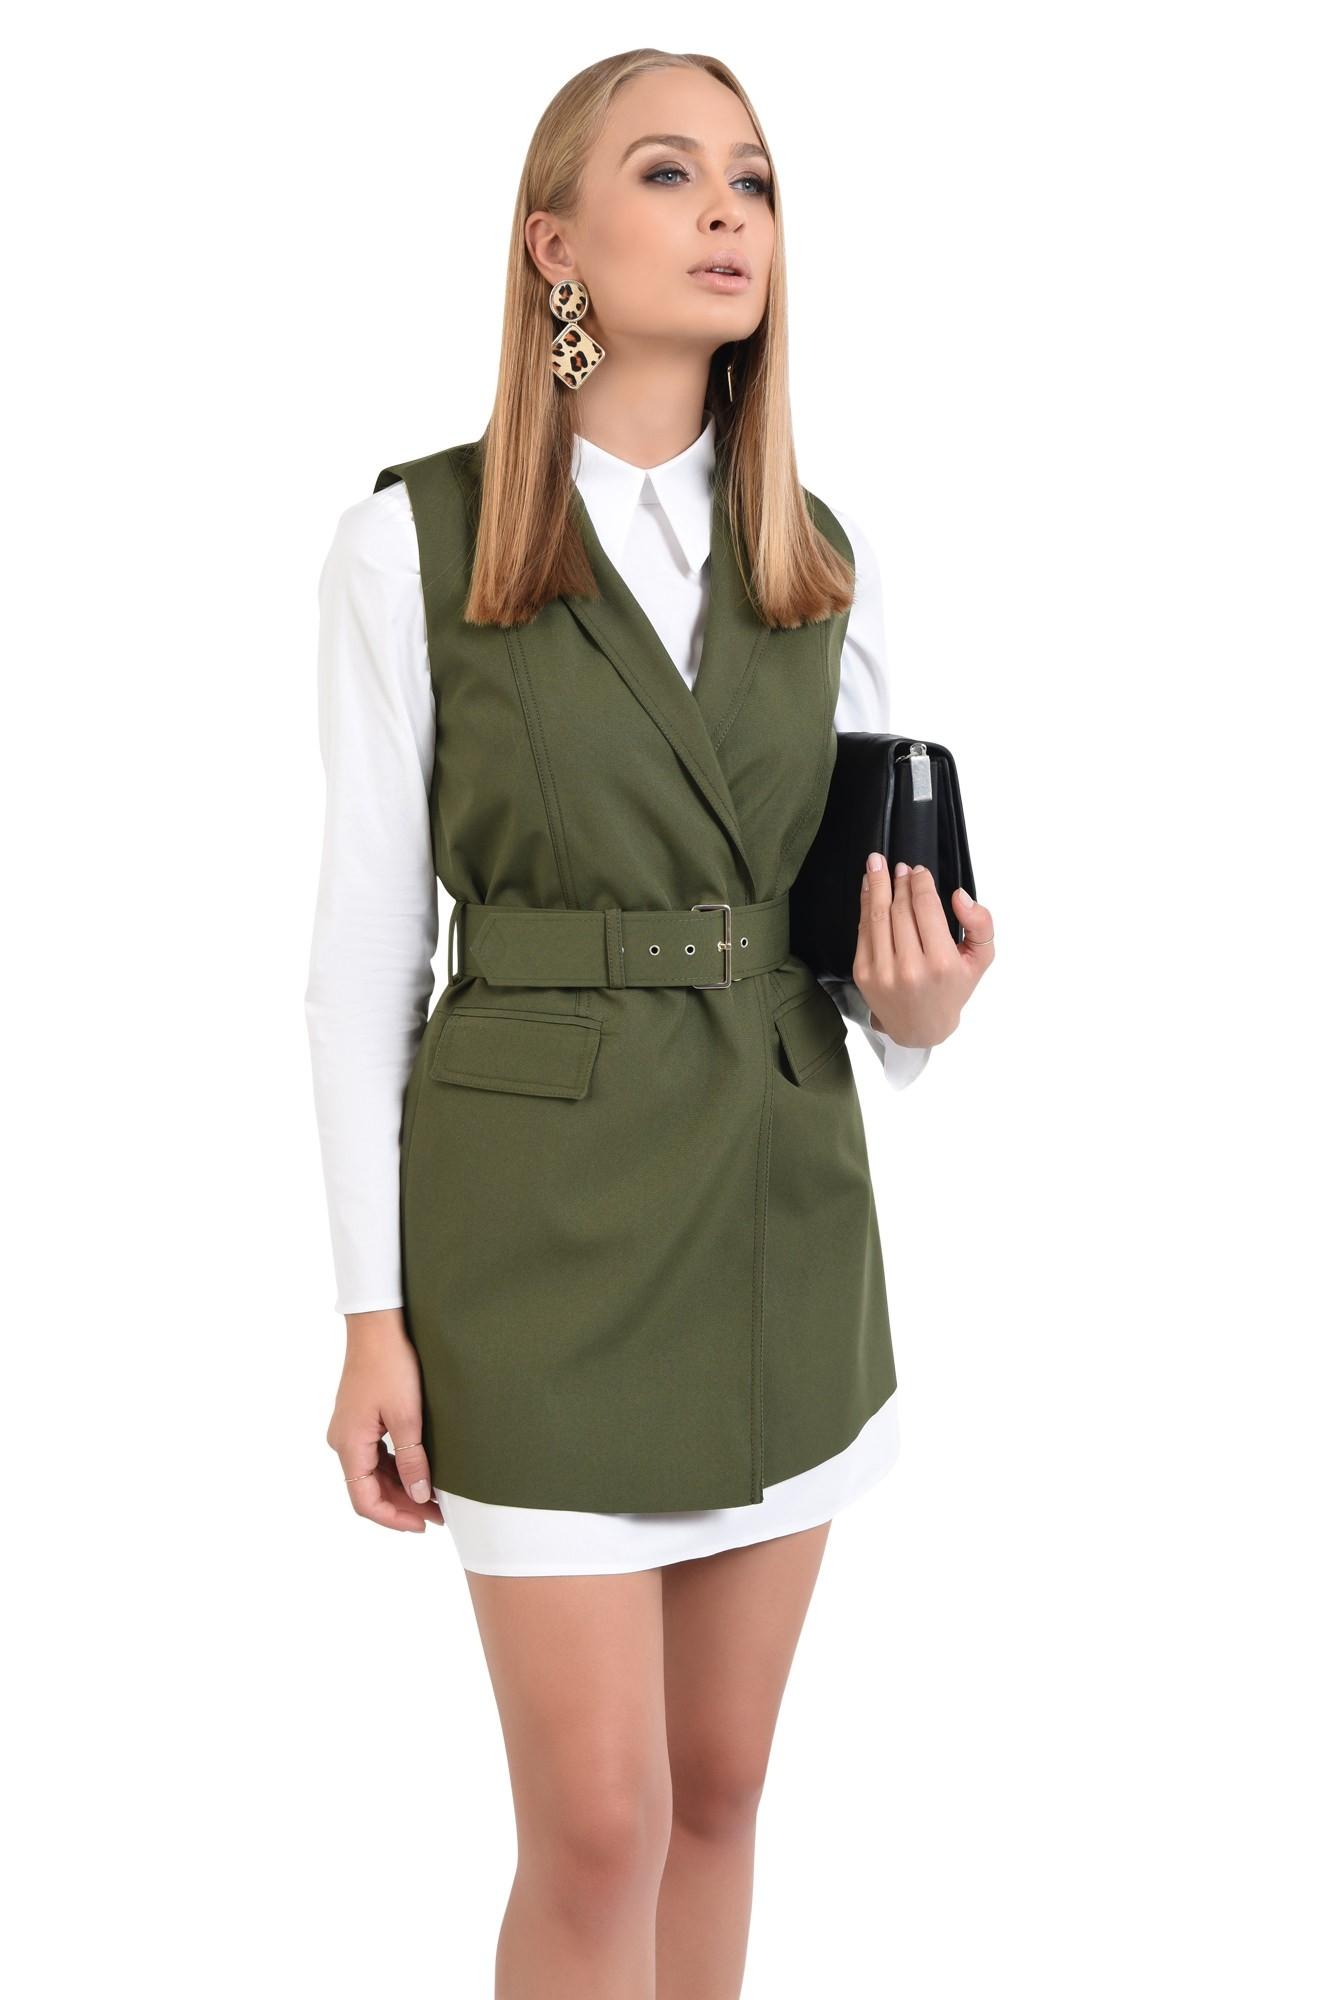 0 - rochie casual, croi lejer, pliuri, guler aplicat, stil camasa